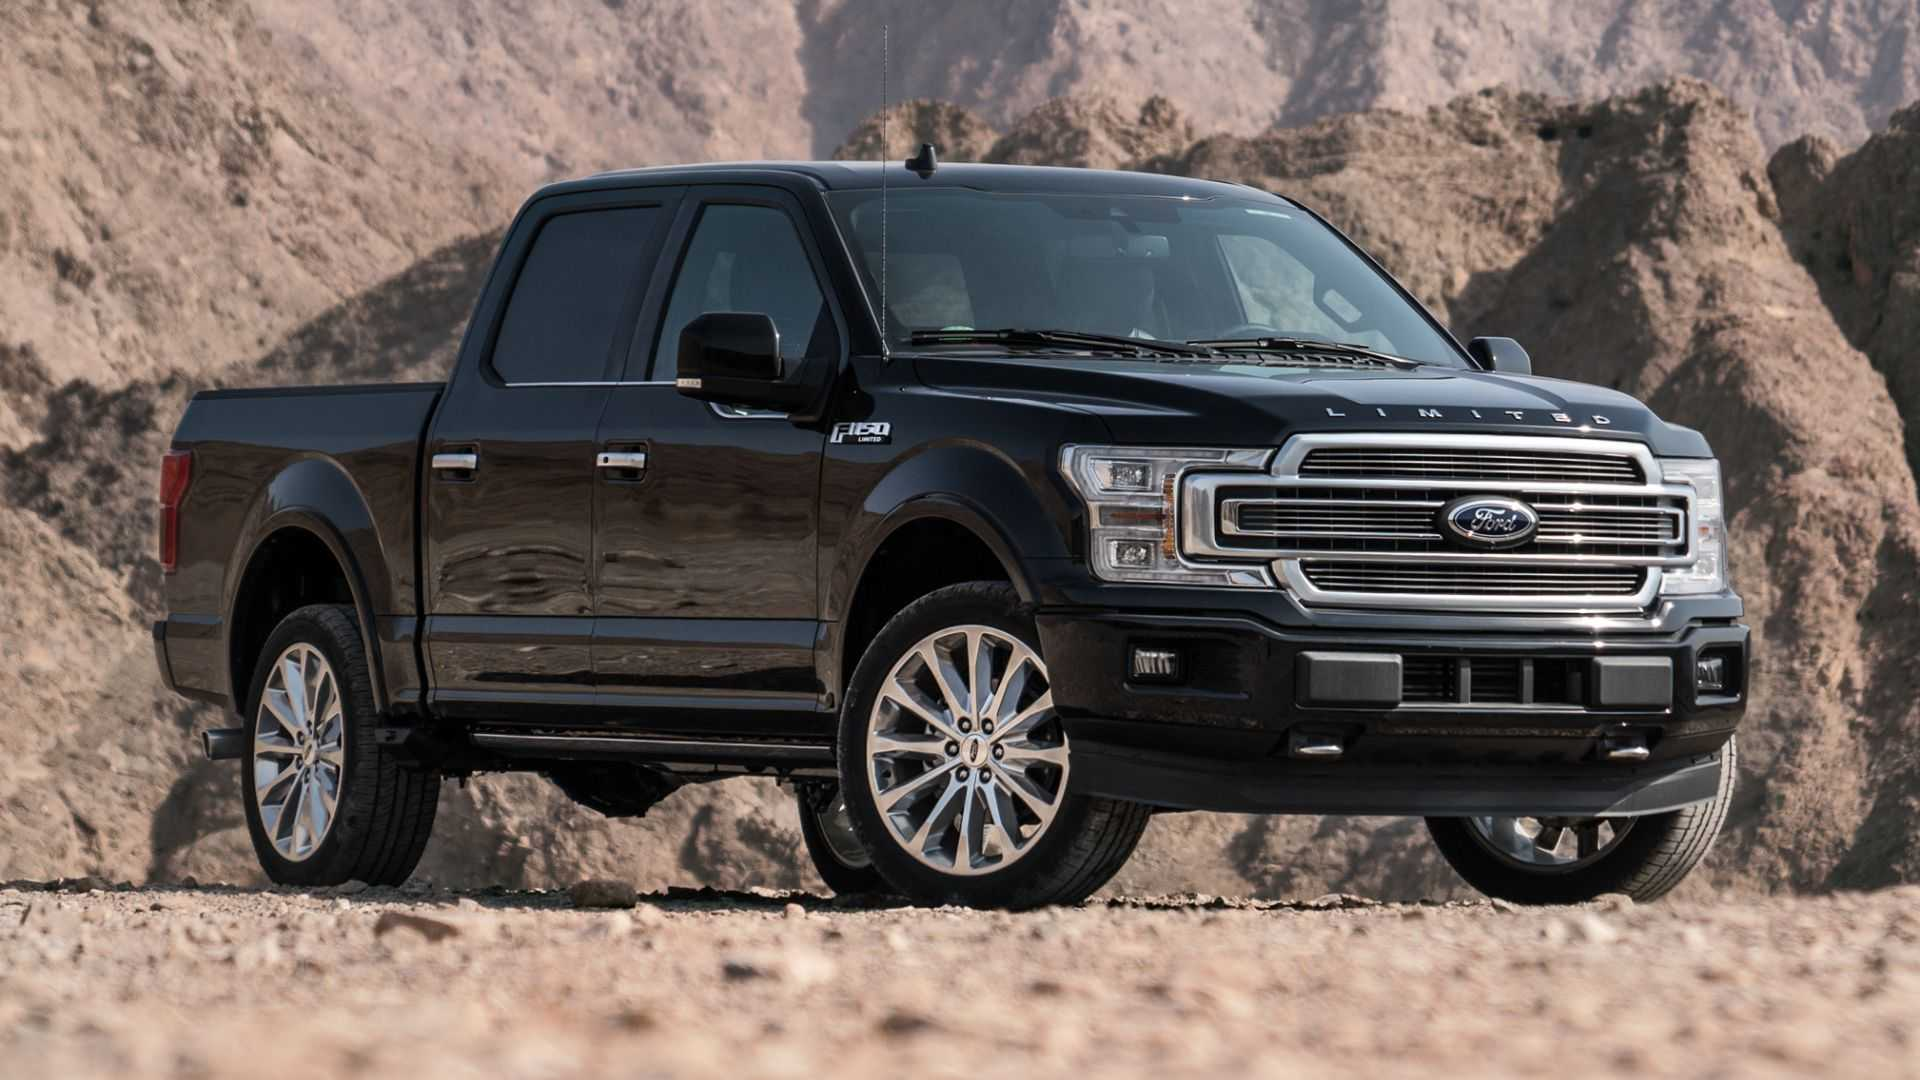 Pickup Truck Comparison: F-150, Silverado, And Ram Versus Japan